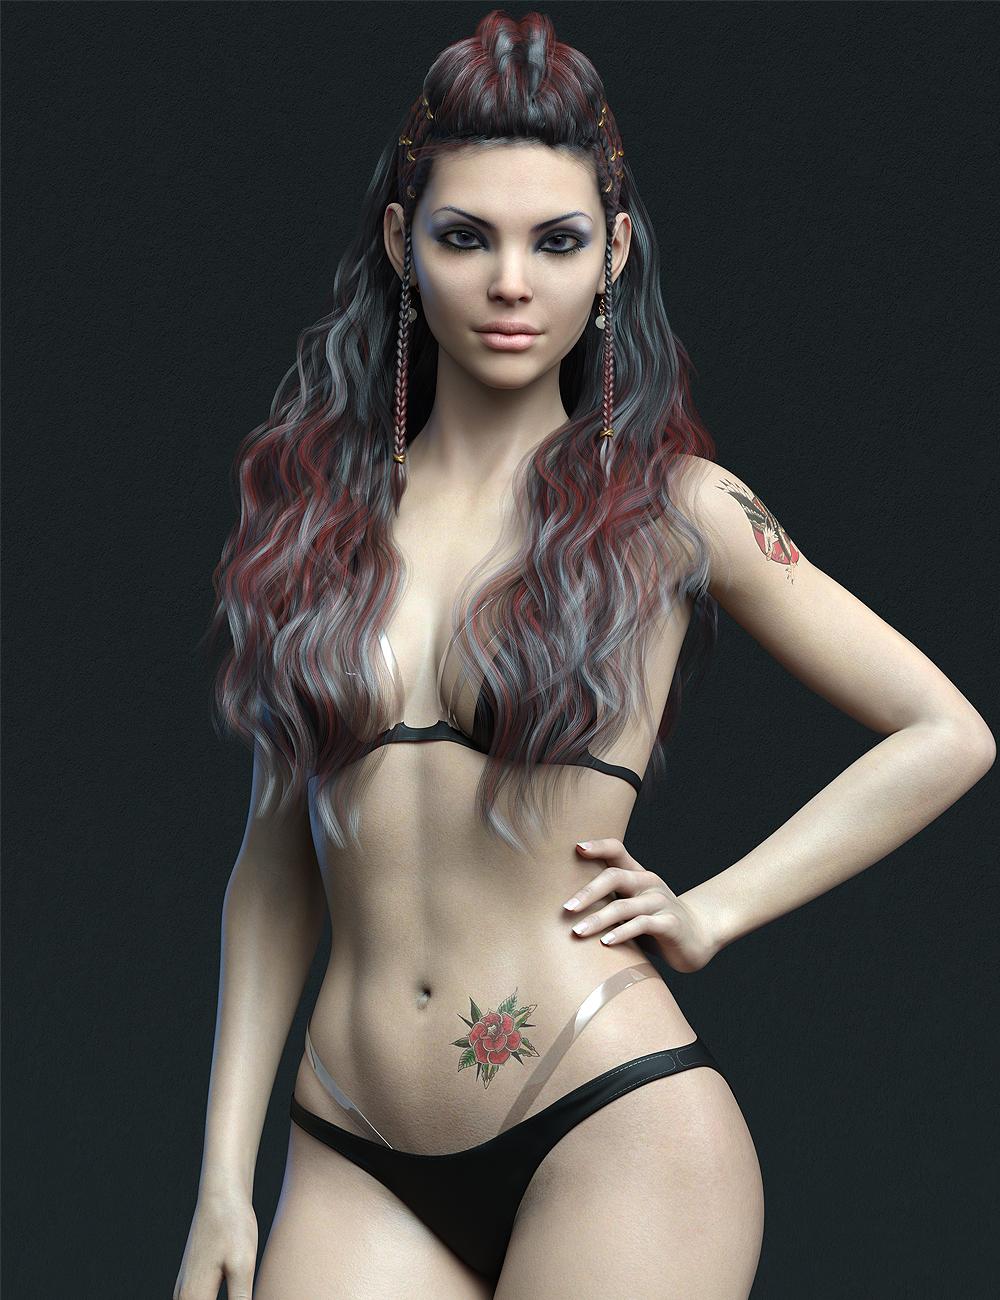 MR Bianca for Genesis 8.1 Female by: Marcius, 3D Models by Daz 3D